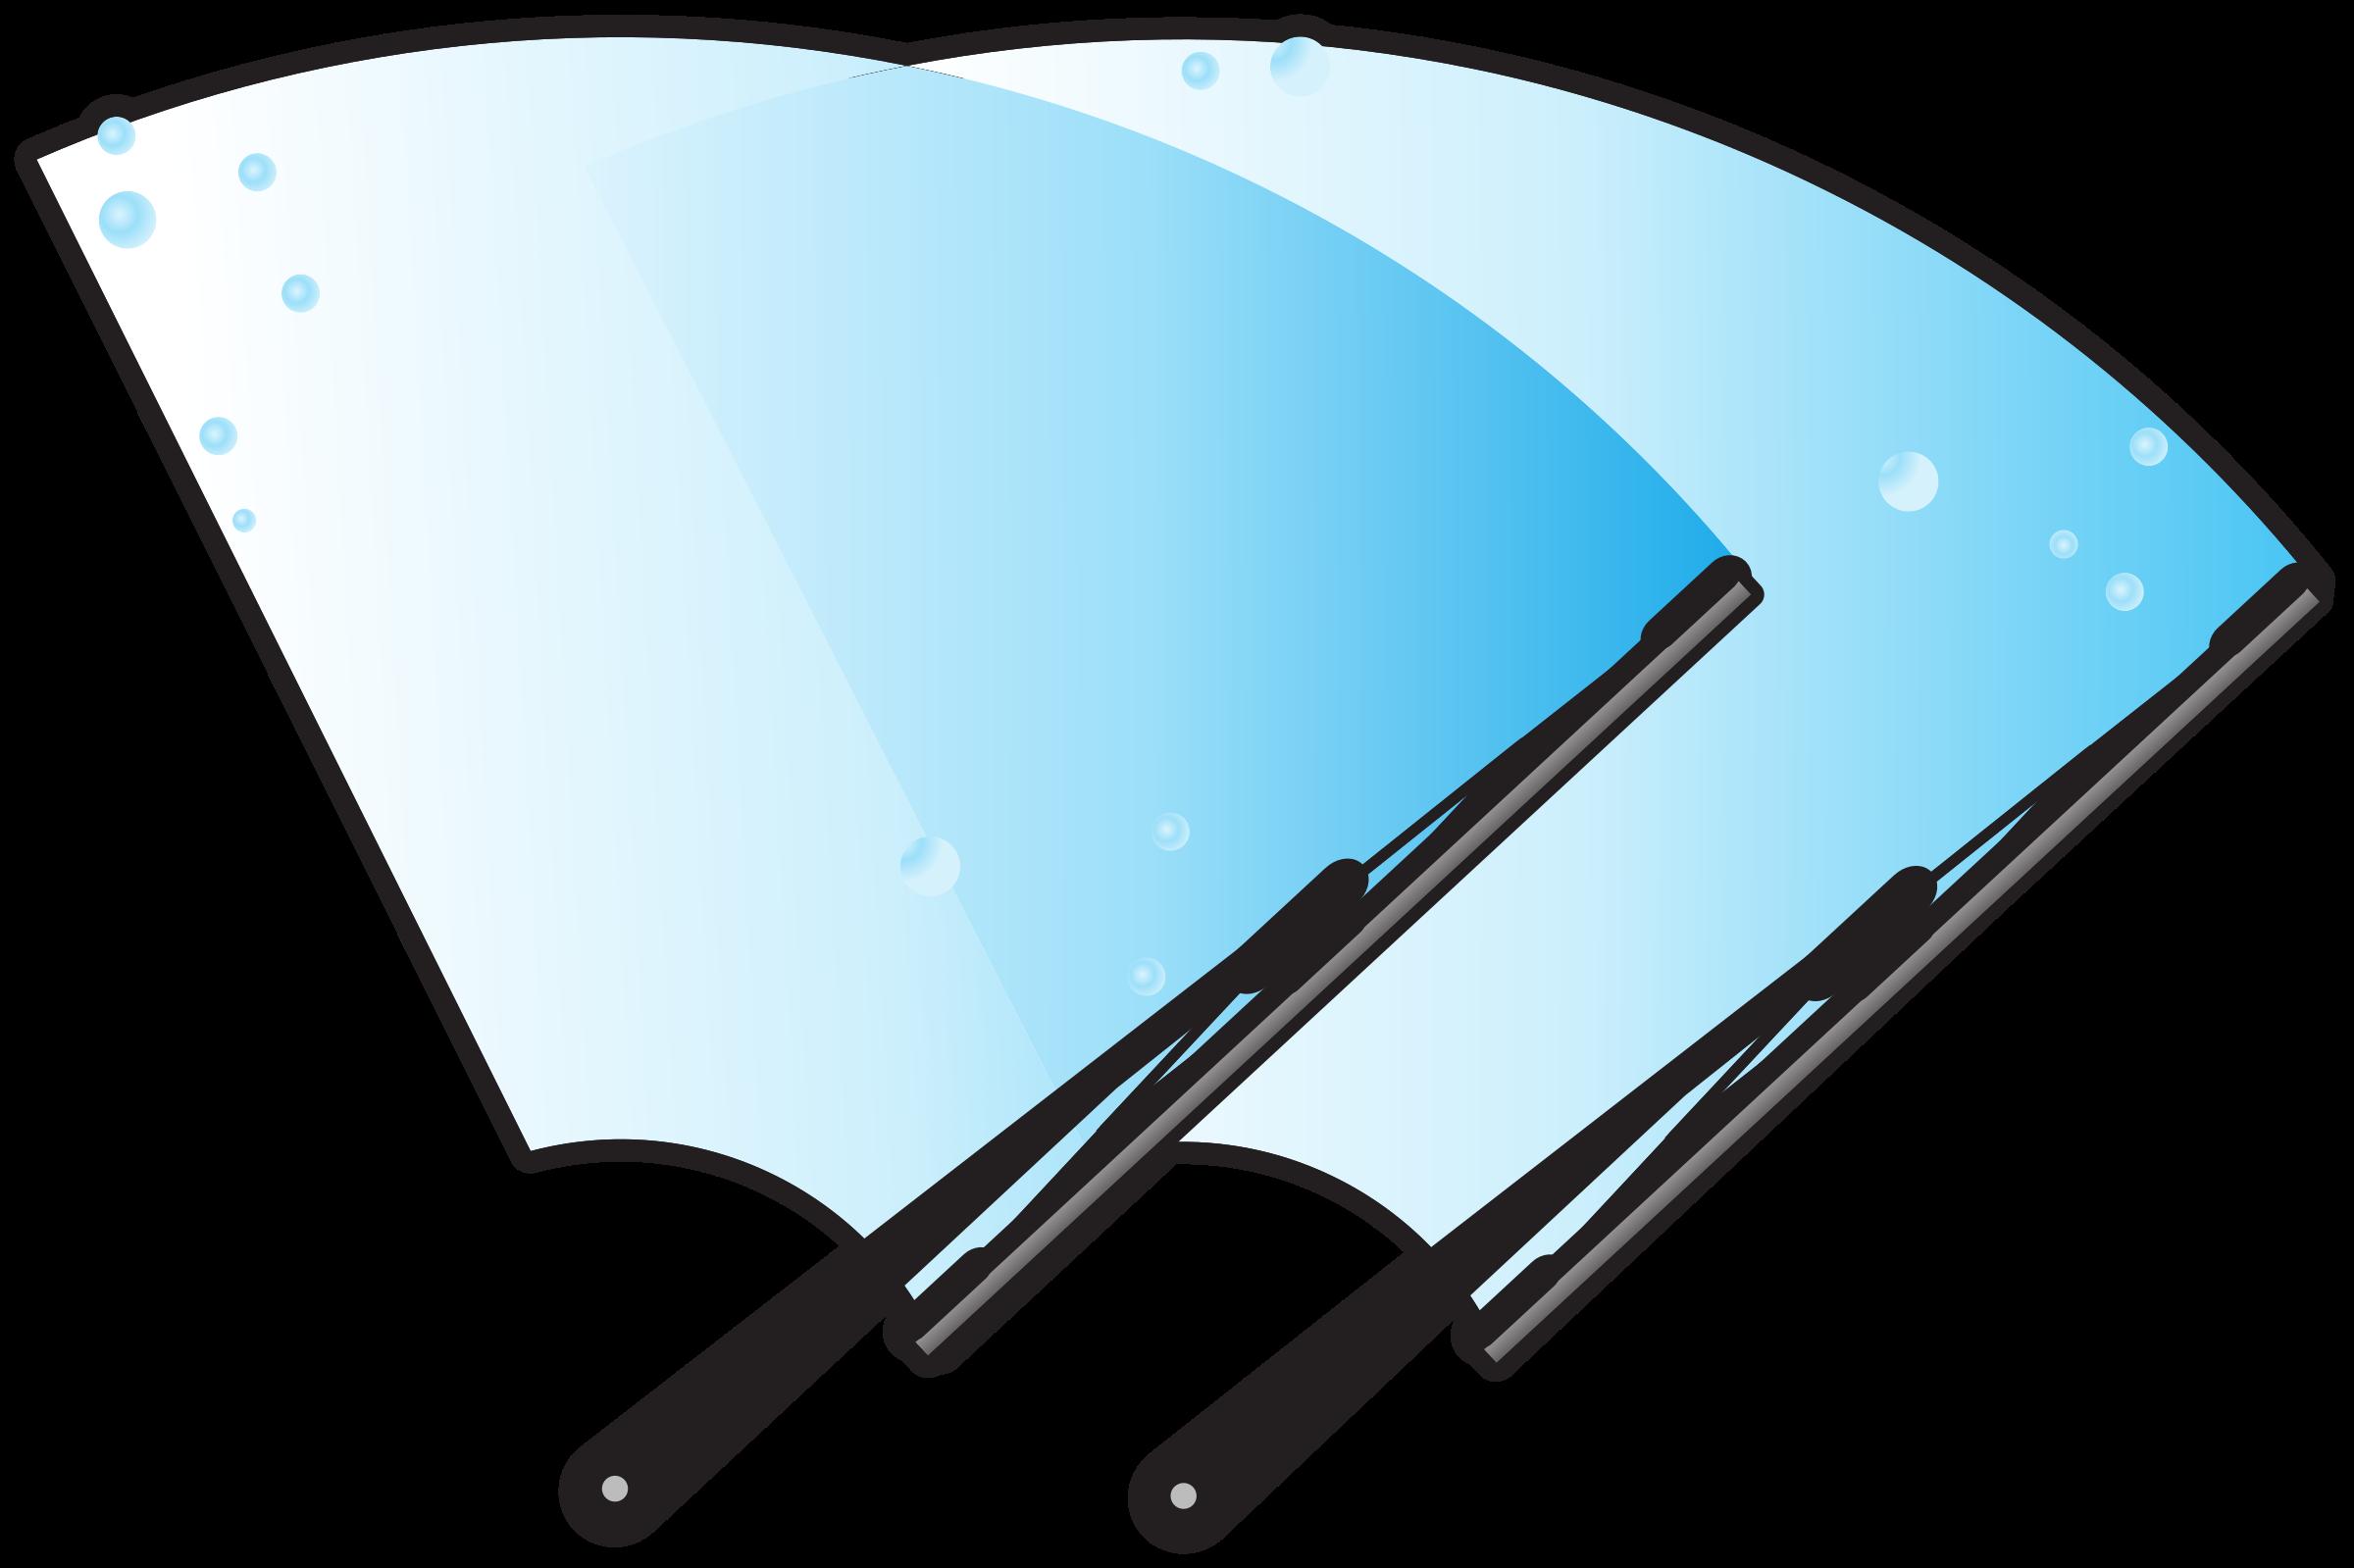 Glass clipart car. Windscreen wipers big image